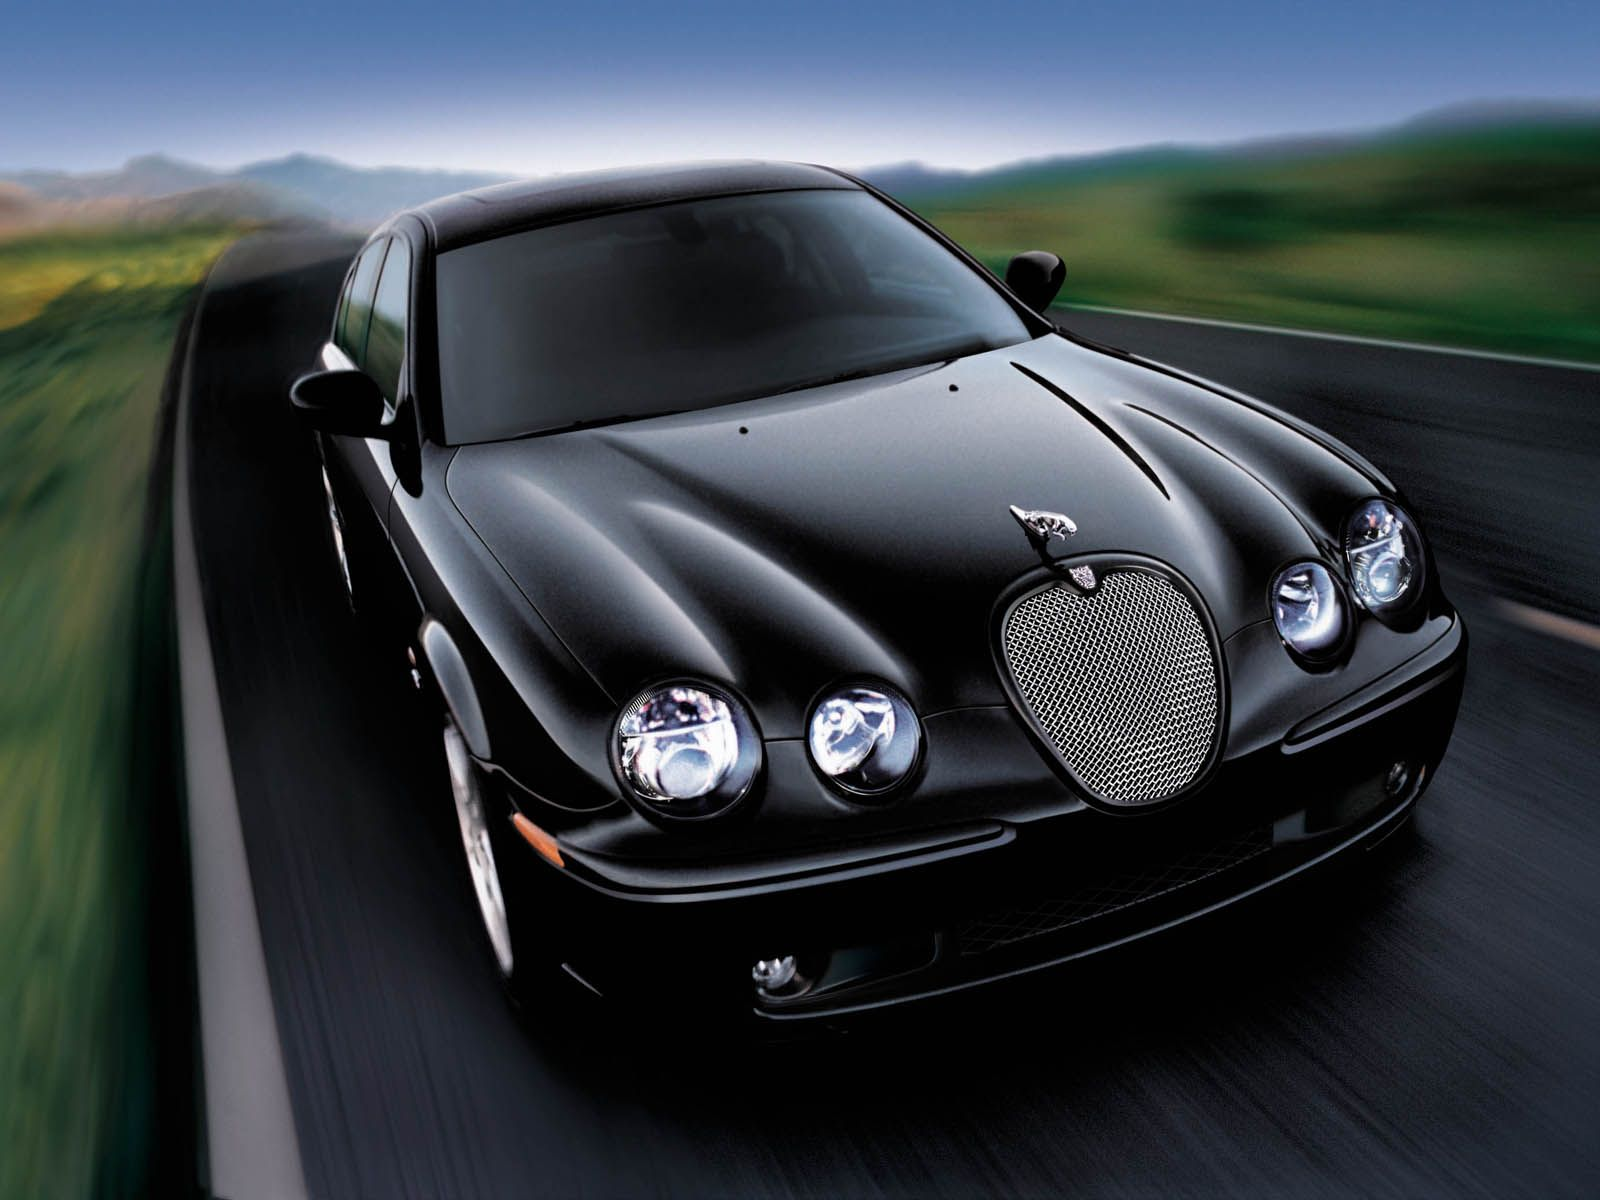 car photo s type jaguar car photo. Black Bedroom Furniture Sets. Home Design Ideas